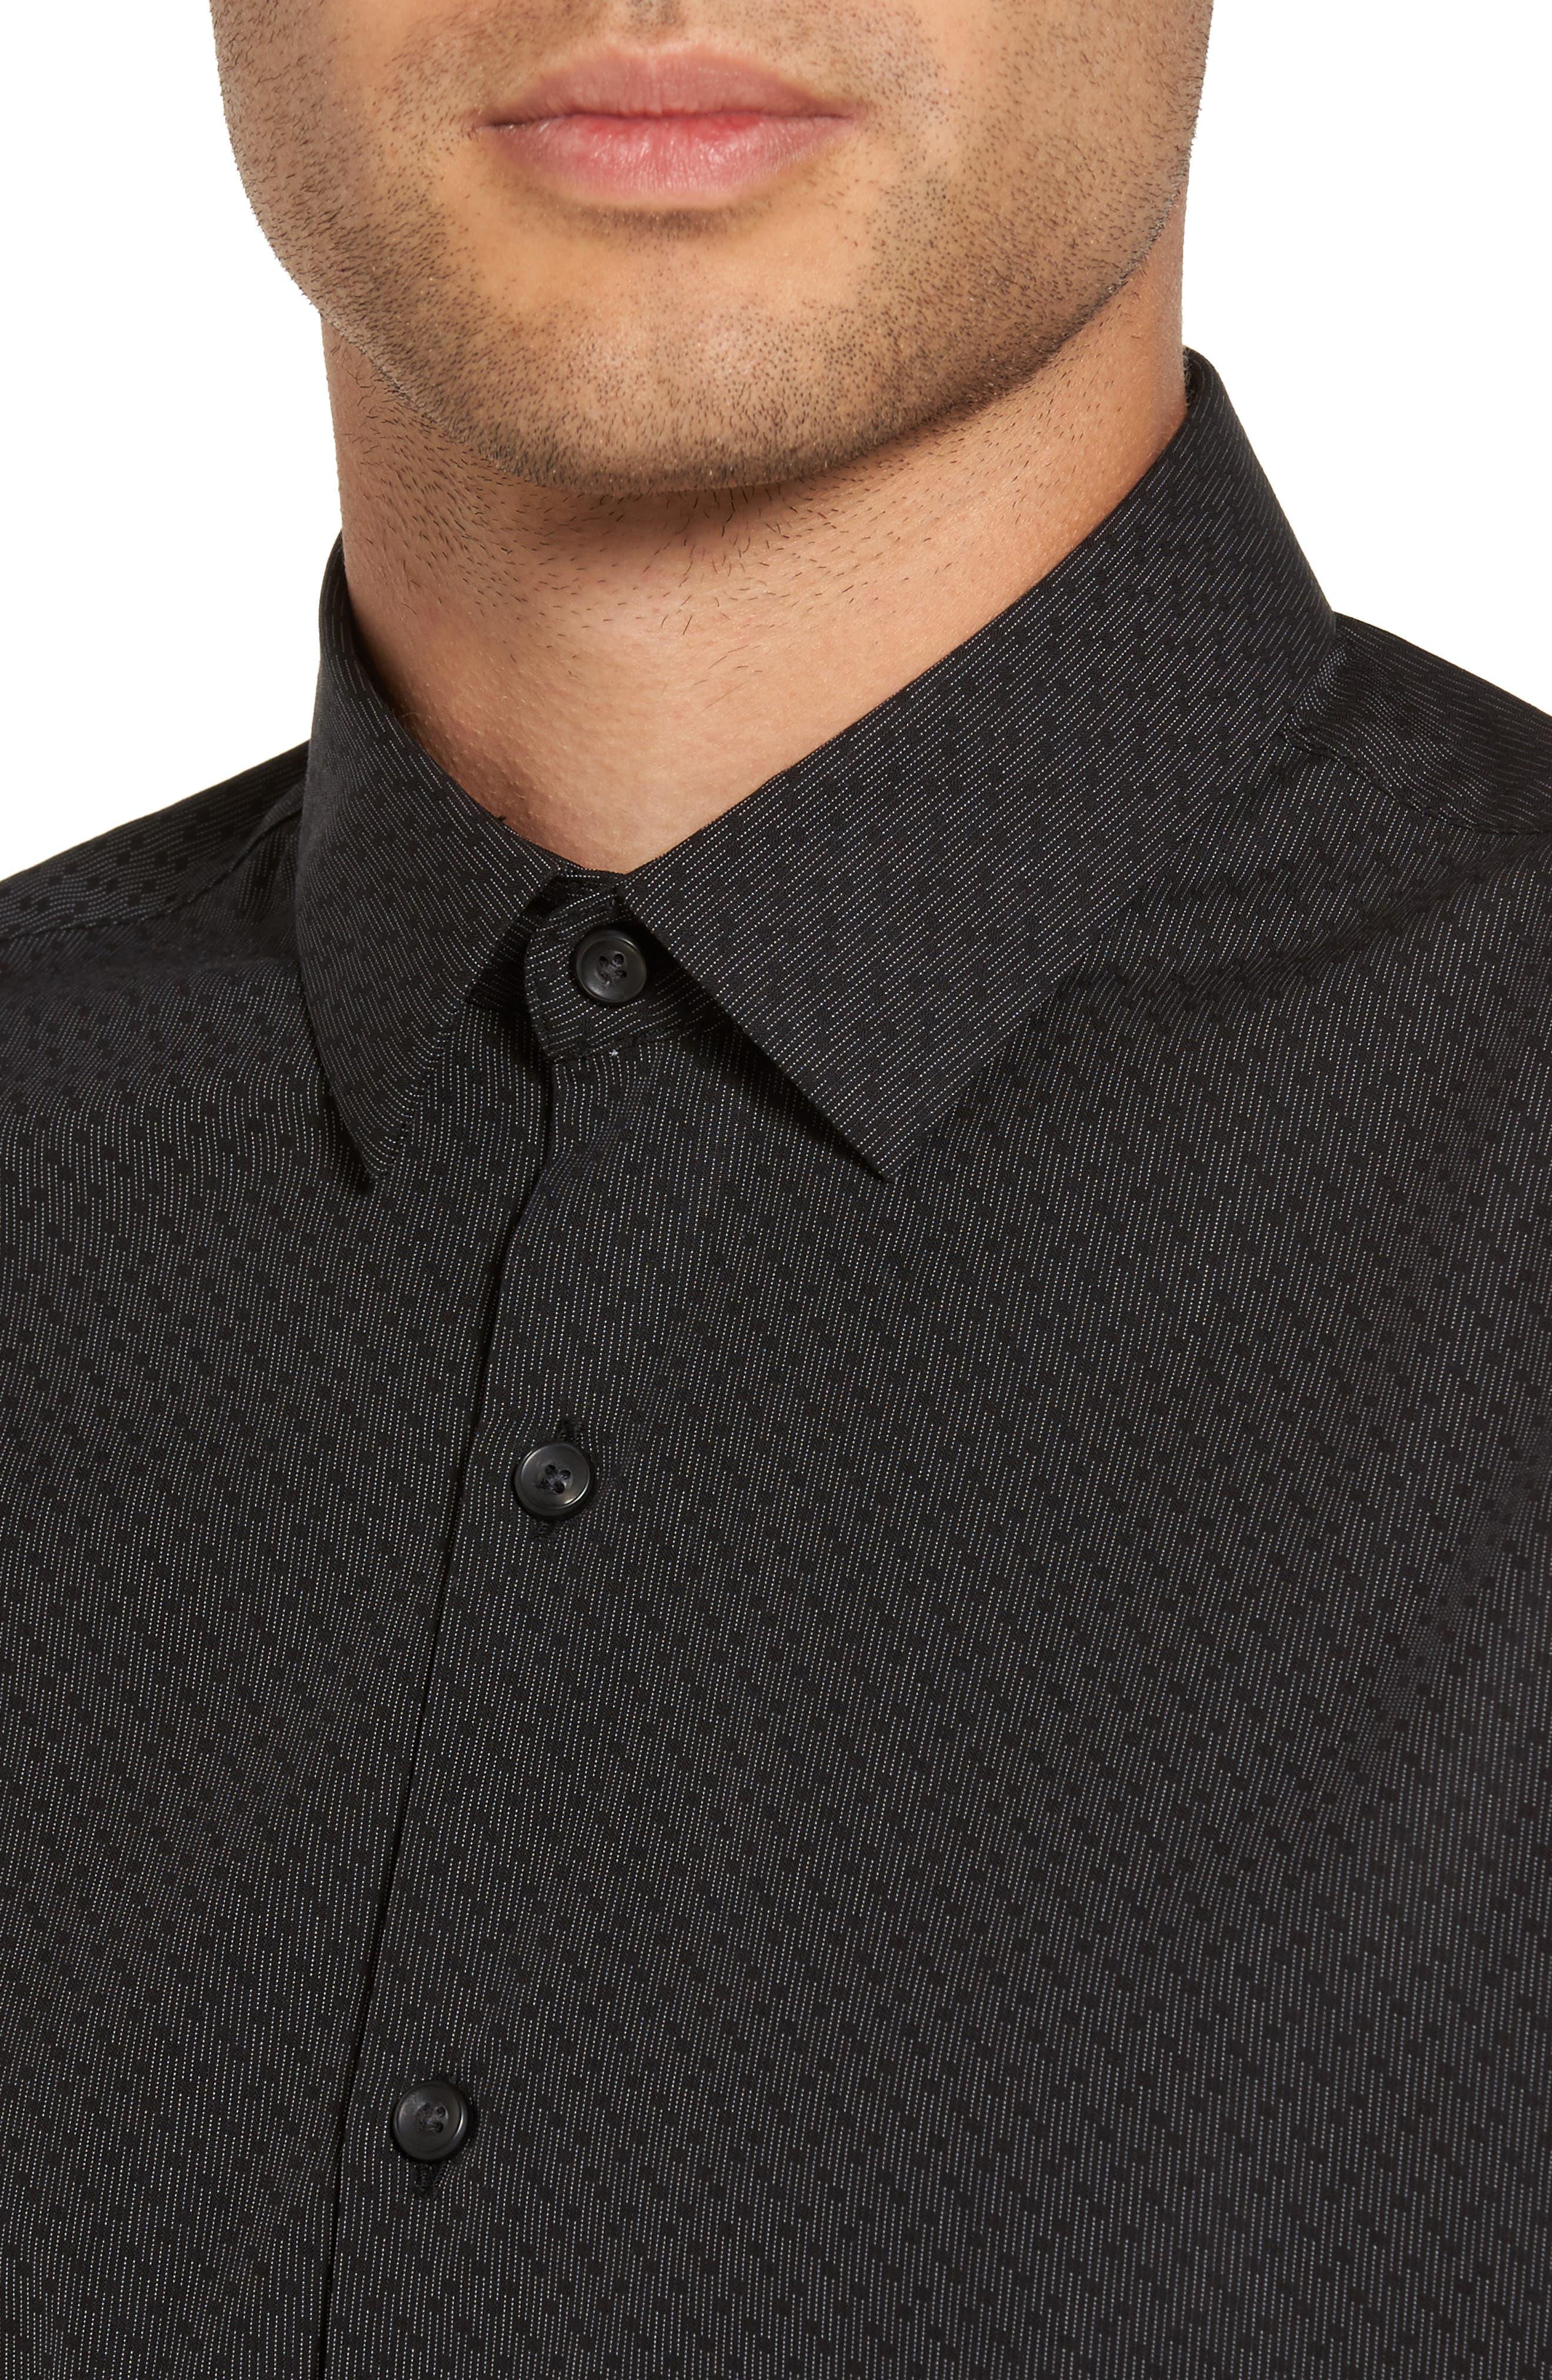 Trim Fit Print Sport Shirt,                             Alternate thumbnail 4, color,                             Black Caviar Dot Dobby